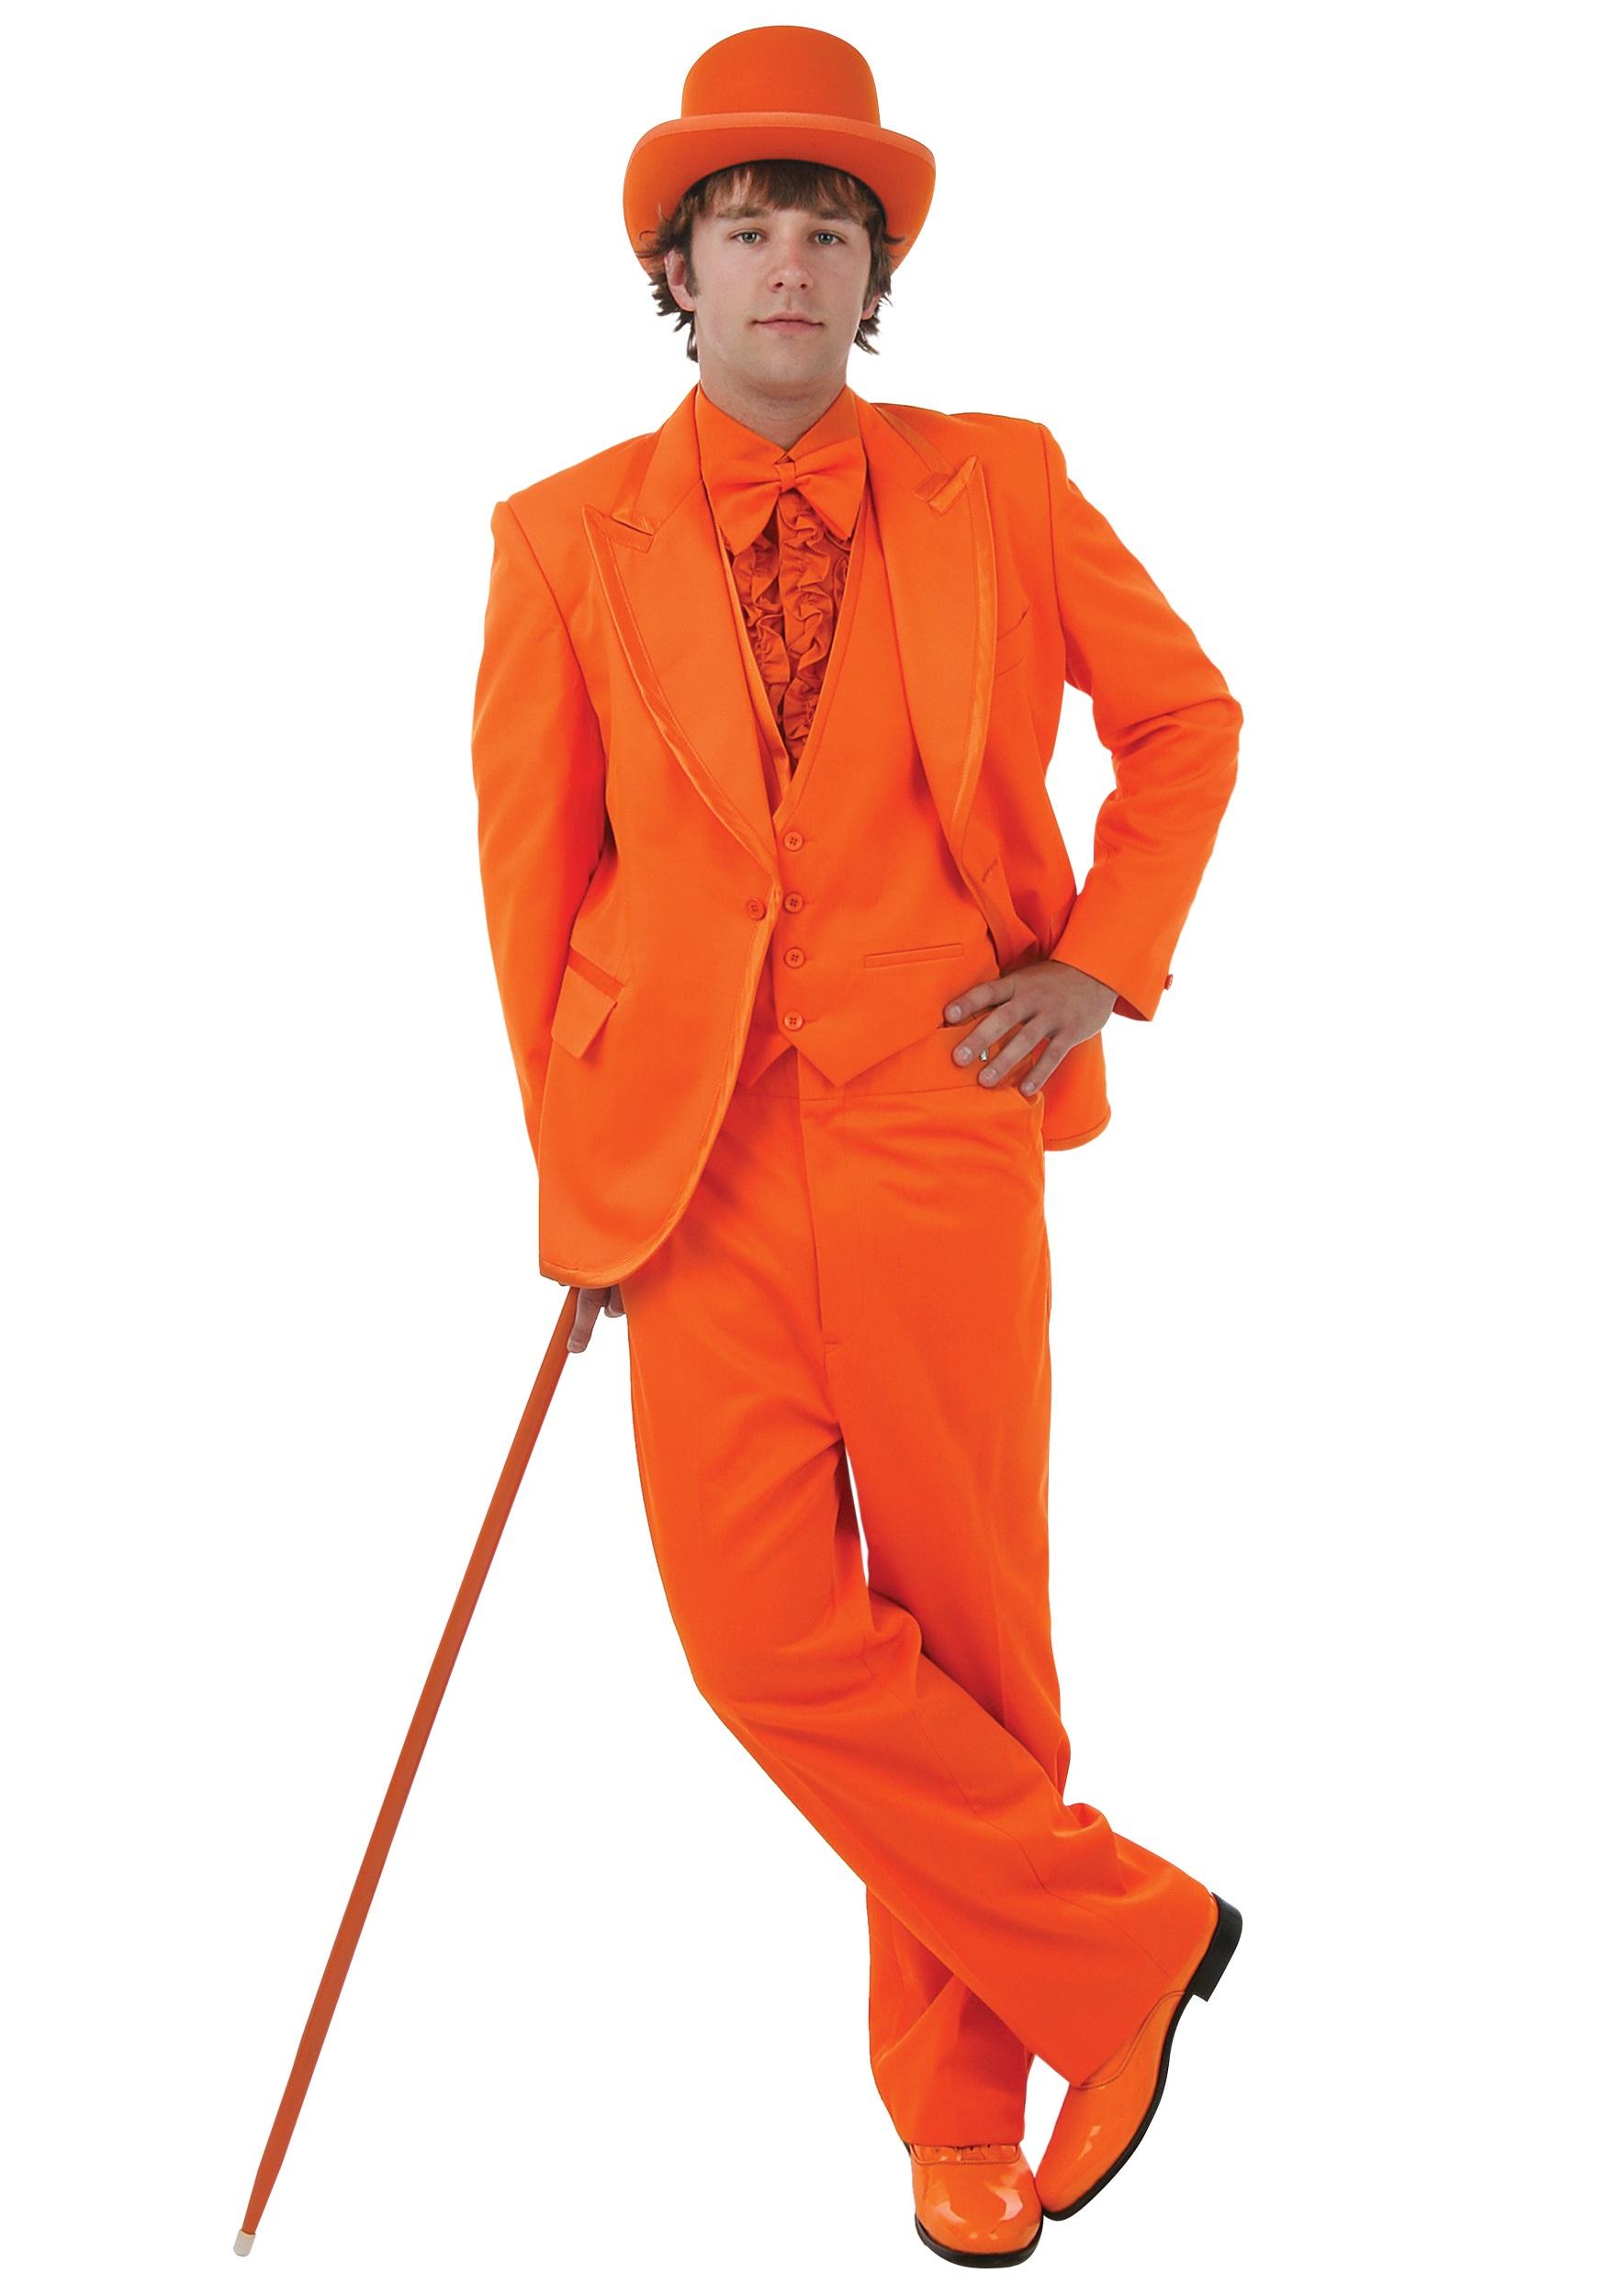 Deluxe Orange Tuxedo - Prom Tuxedo Rentals